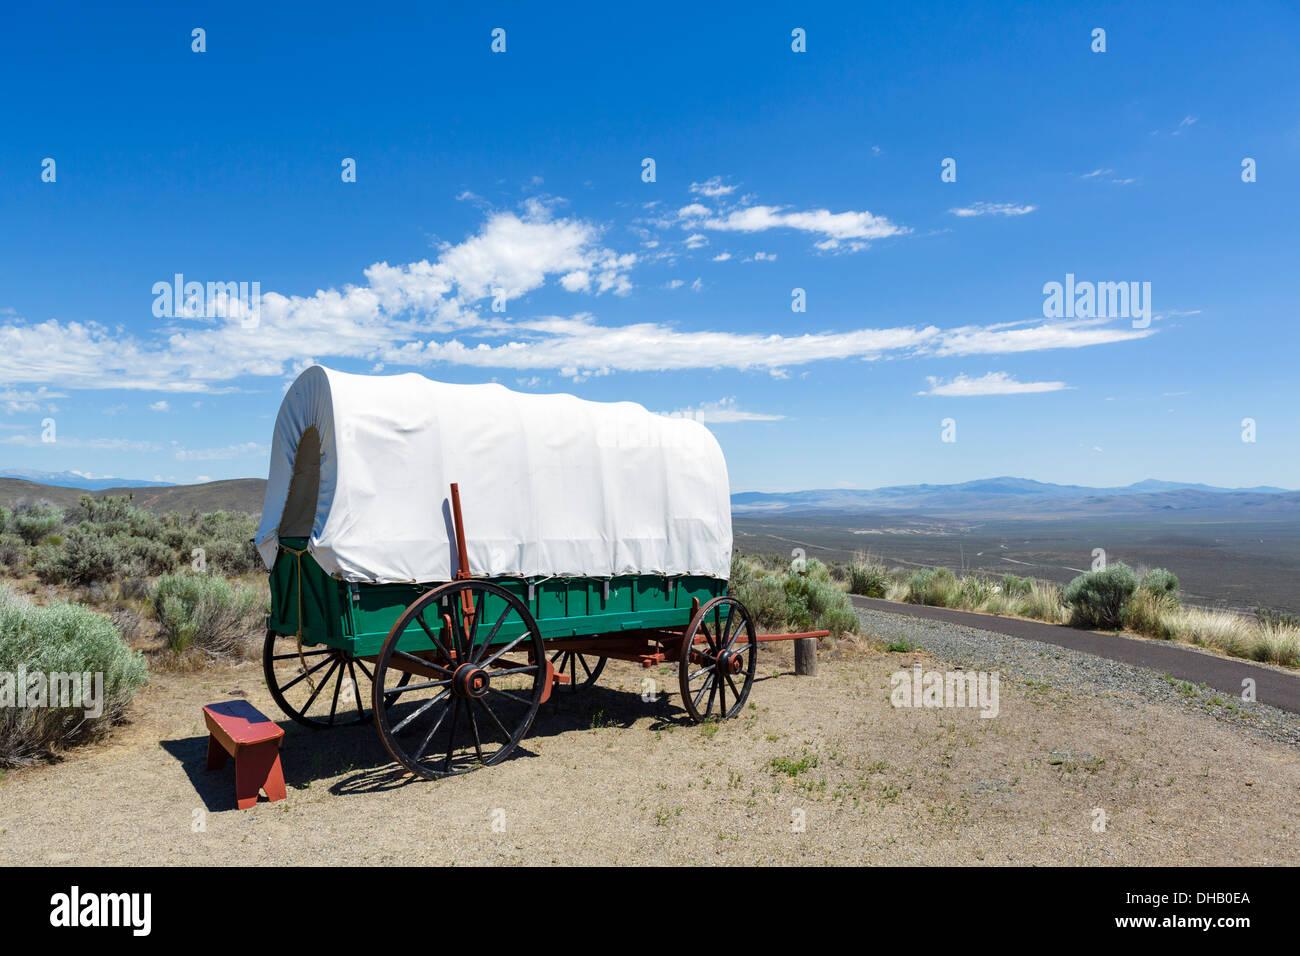 Covered wagon at the Wagon Encampment, National Historic Oregon Trail Interpretive Center, Baker, Oregon, USA - Stock Image